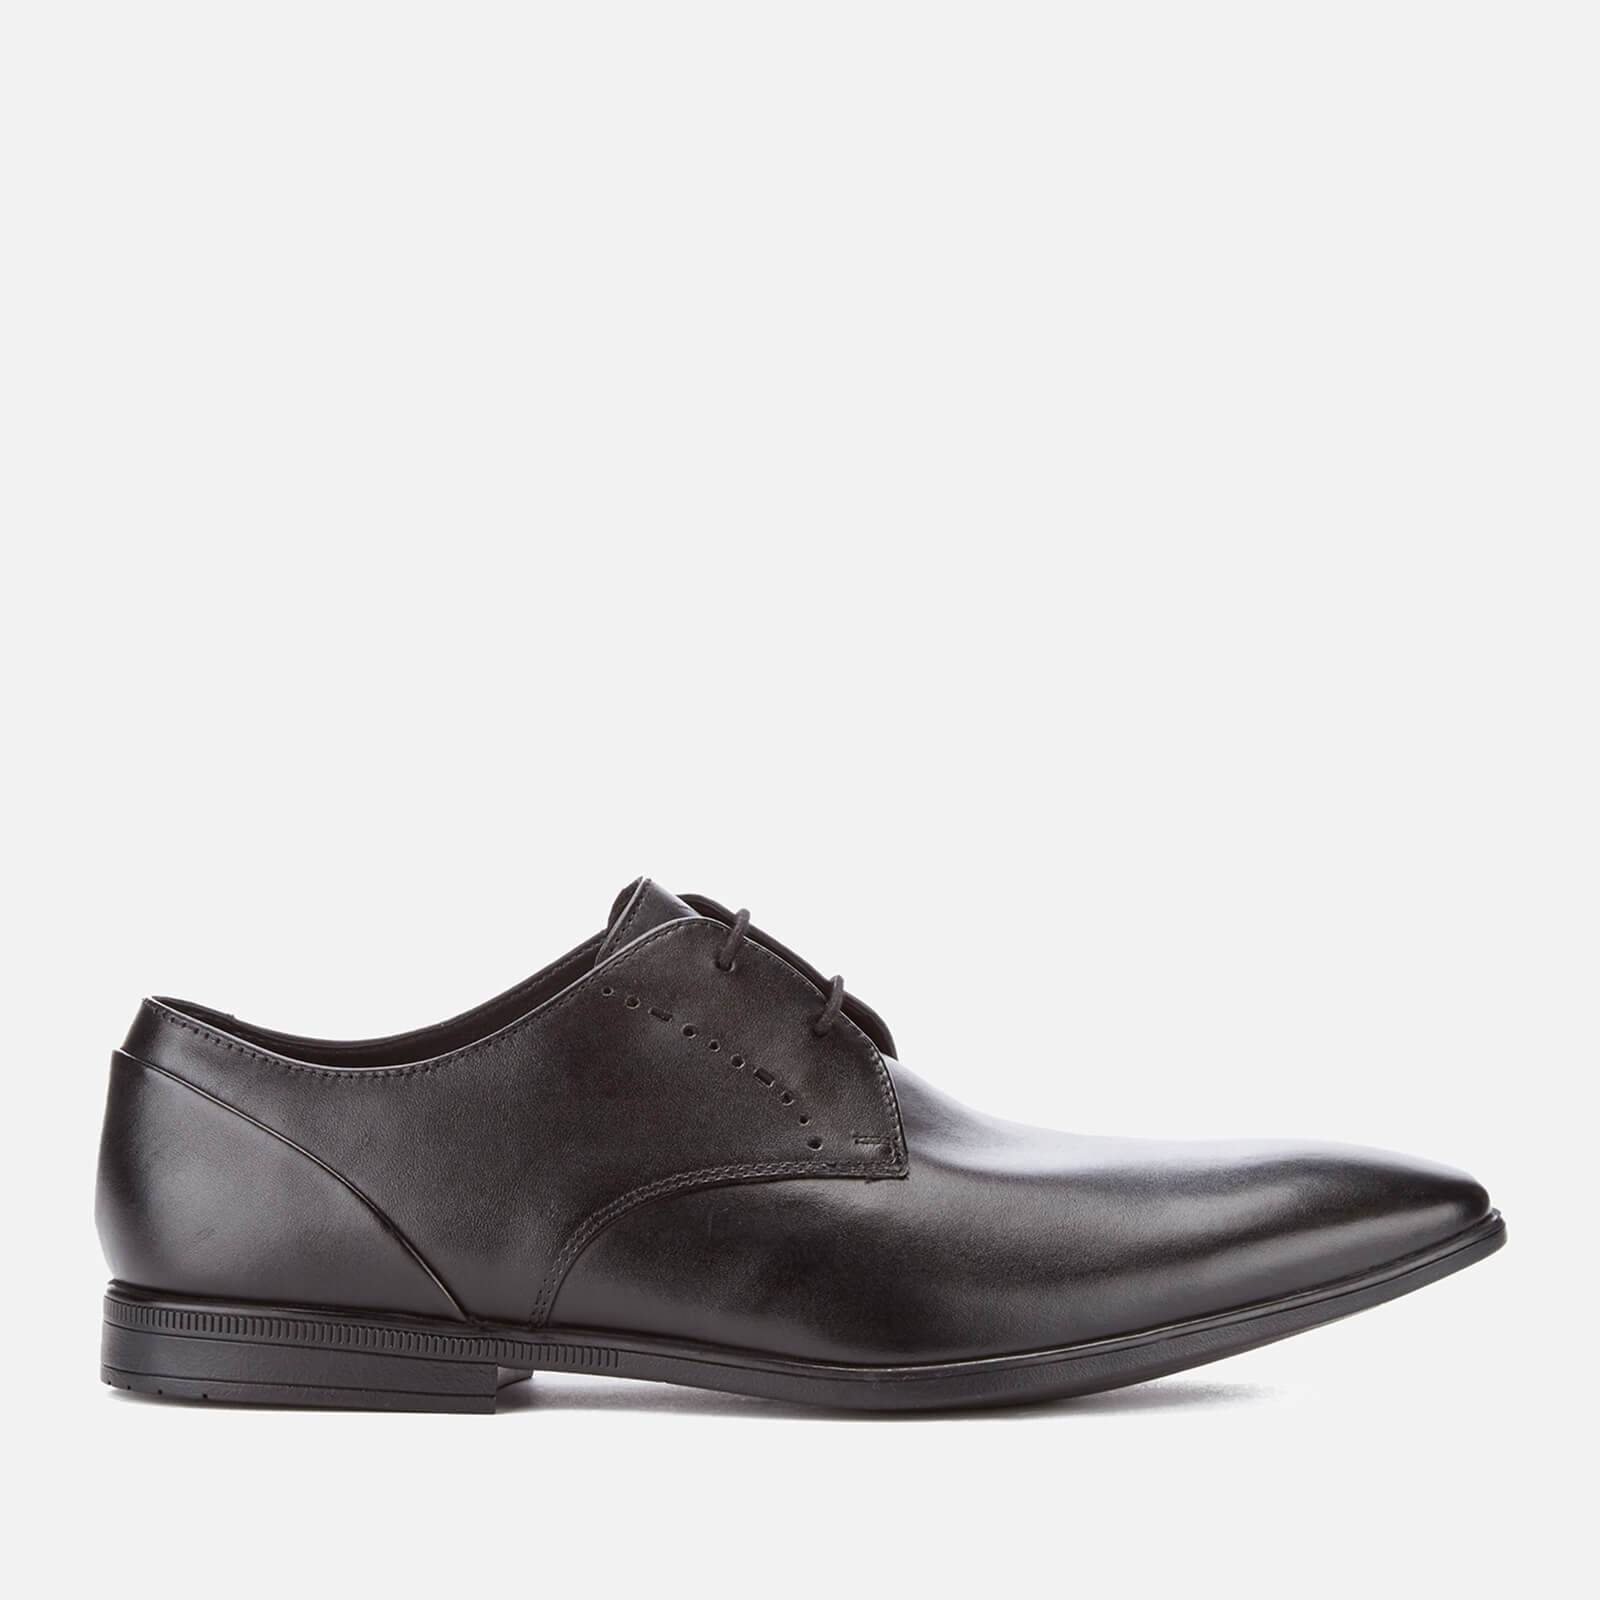 Clarks Men's Bampton Lace Leather Derby Shoes - Black - UK 10